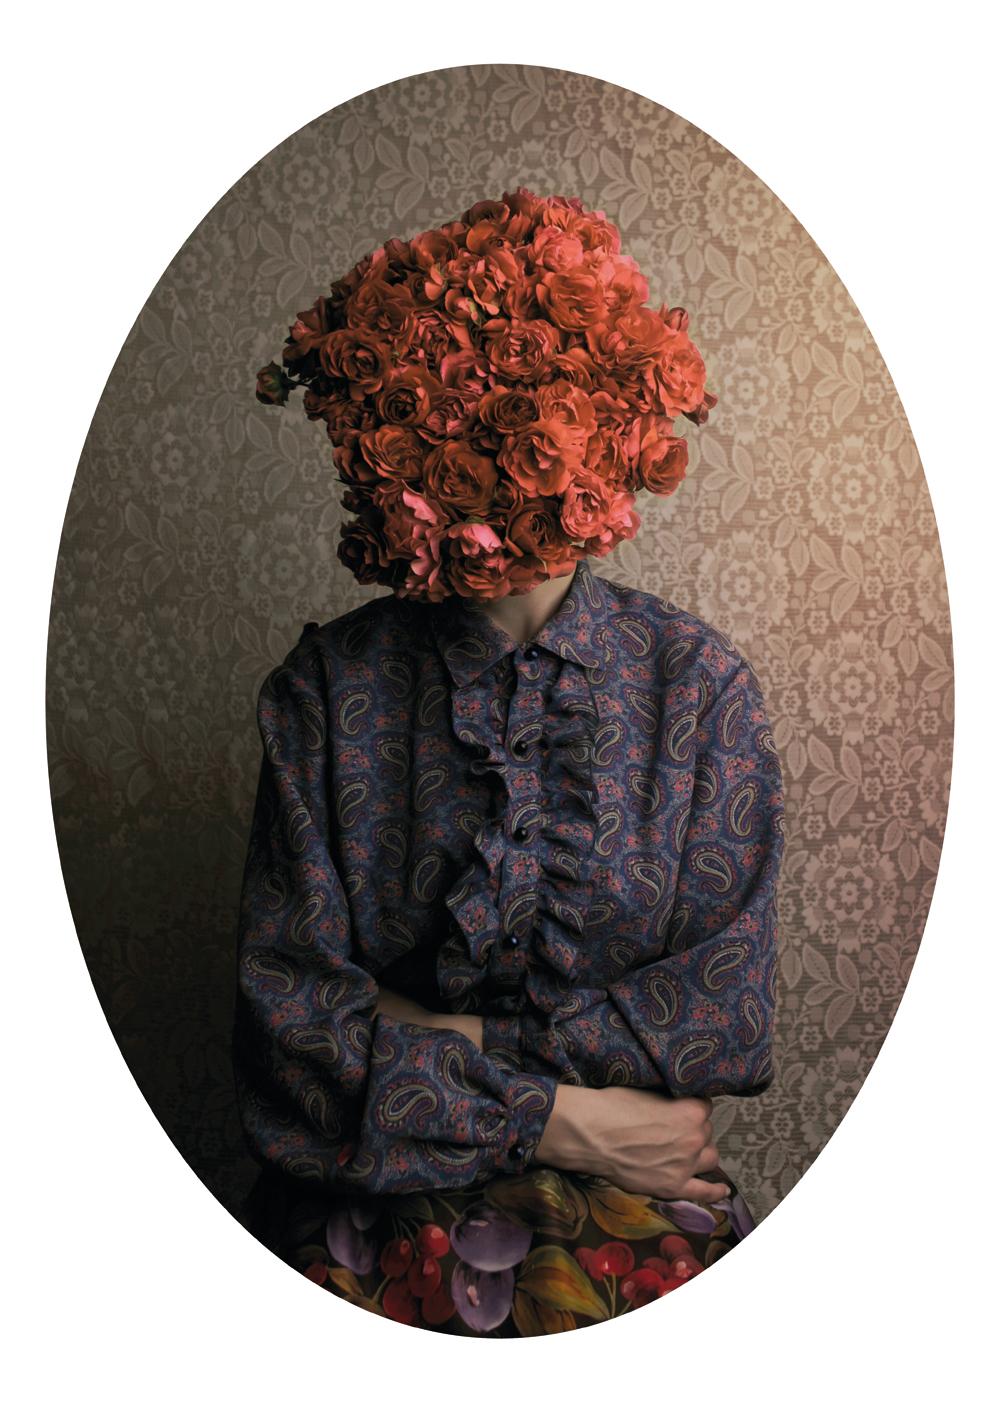 Slevin Aaron, fotograf, fotografia, vouge, kobiety, artysta i sztuka, moda